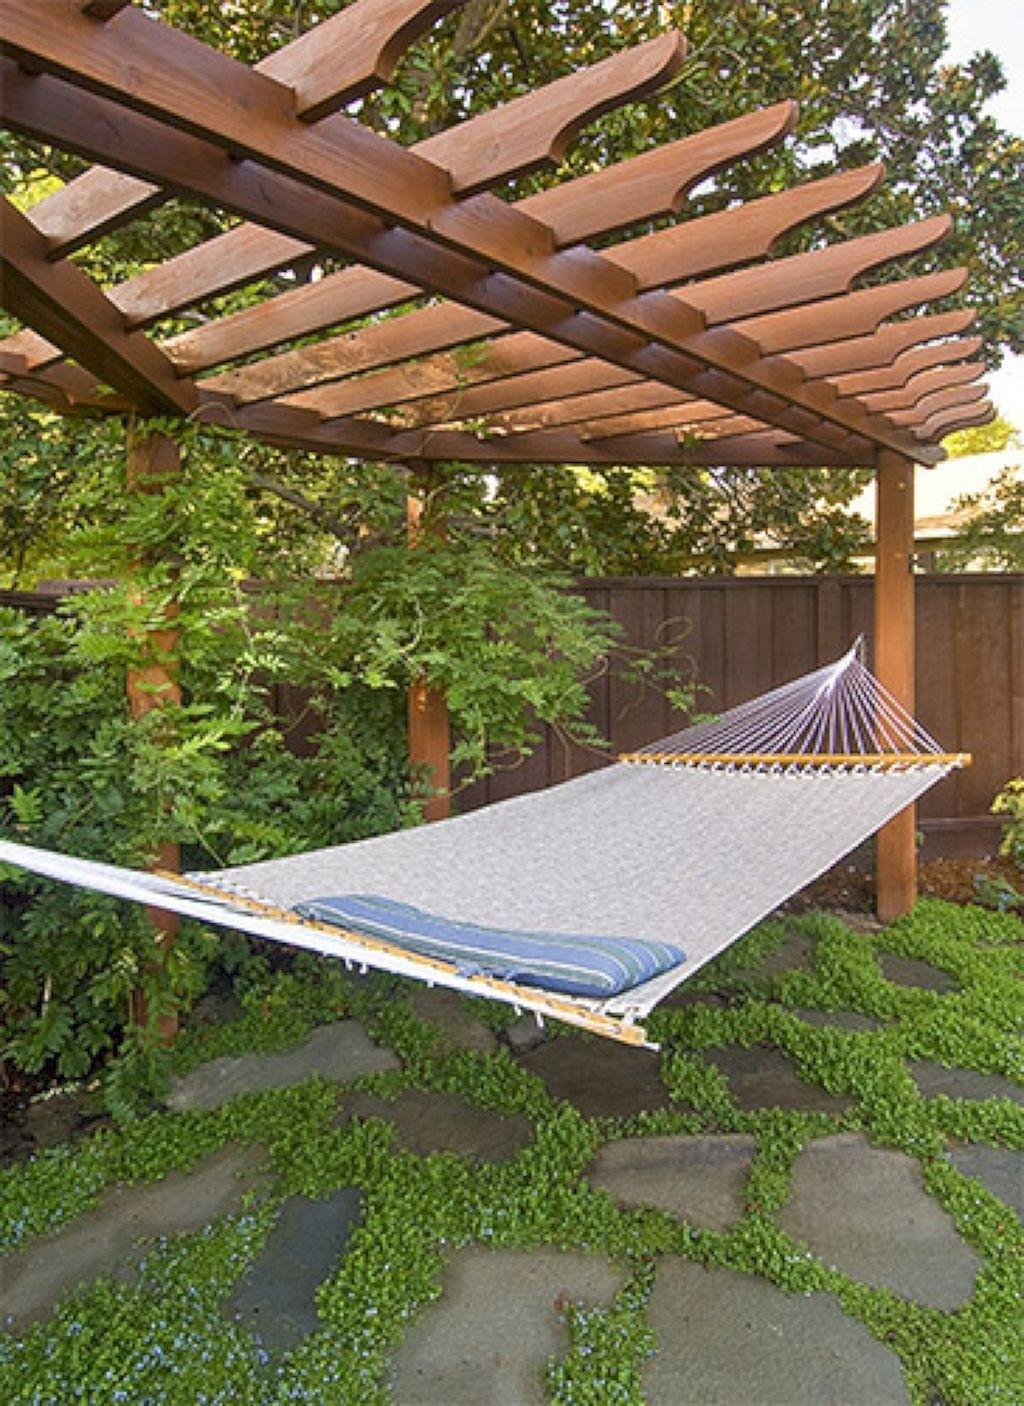 hammock chair frame diy wood desk no wheels patio stands ideas on foter